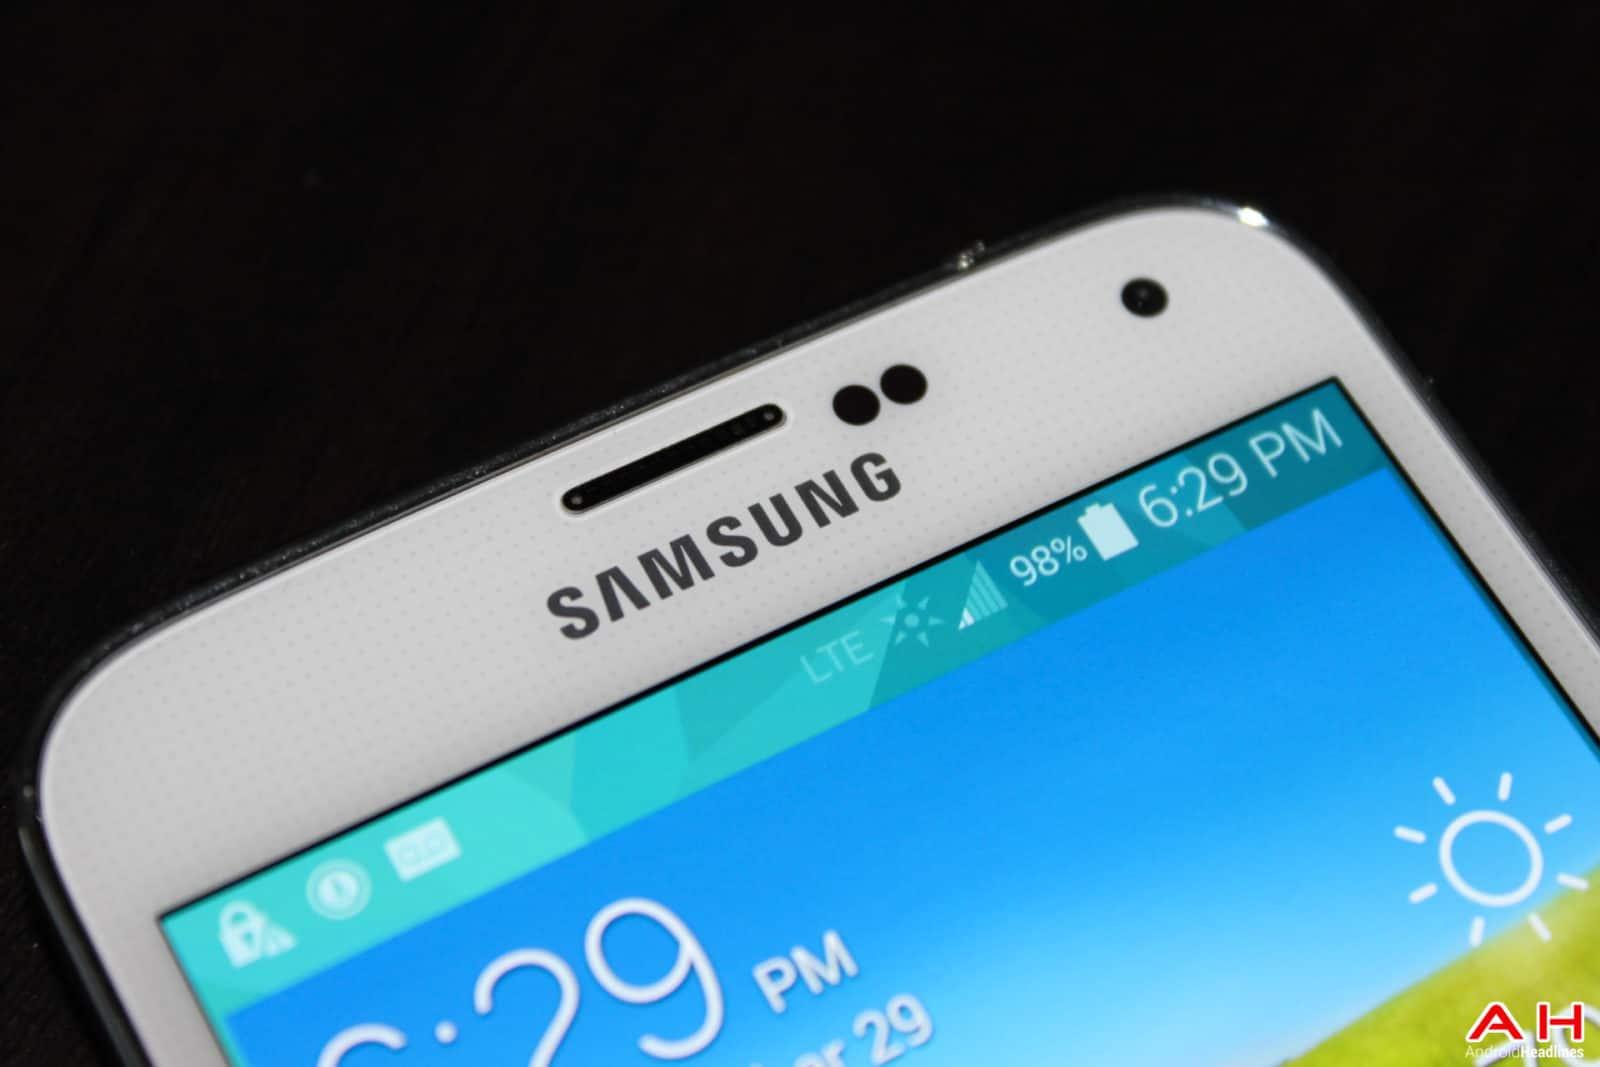 AH Samsung Galaxy S5 -10 LOGO